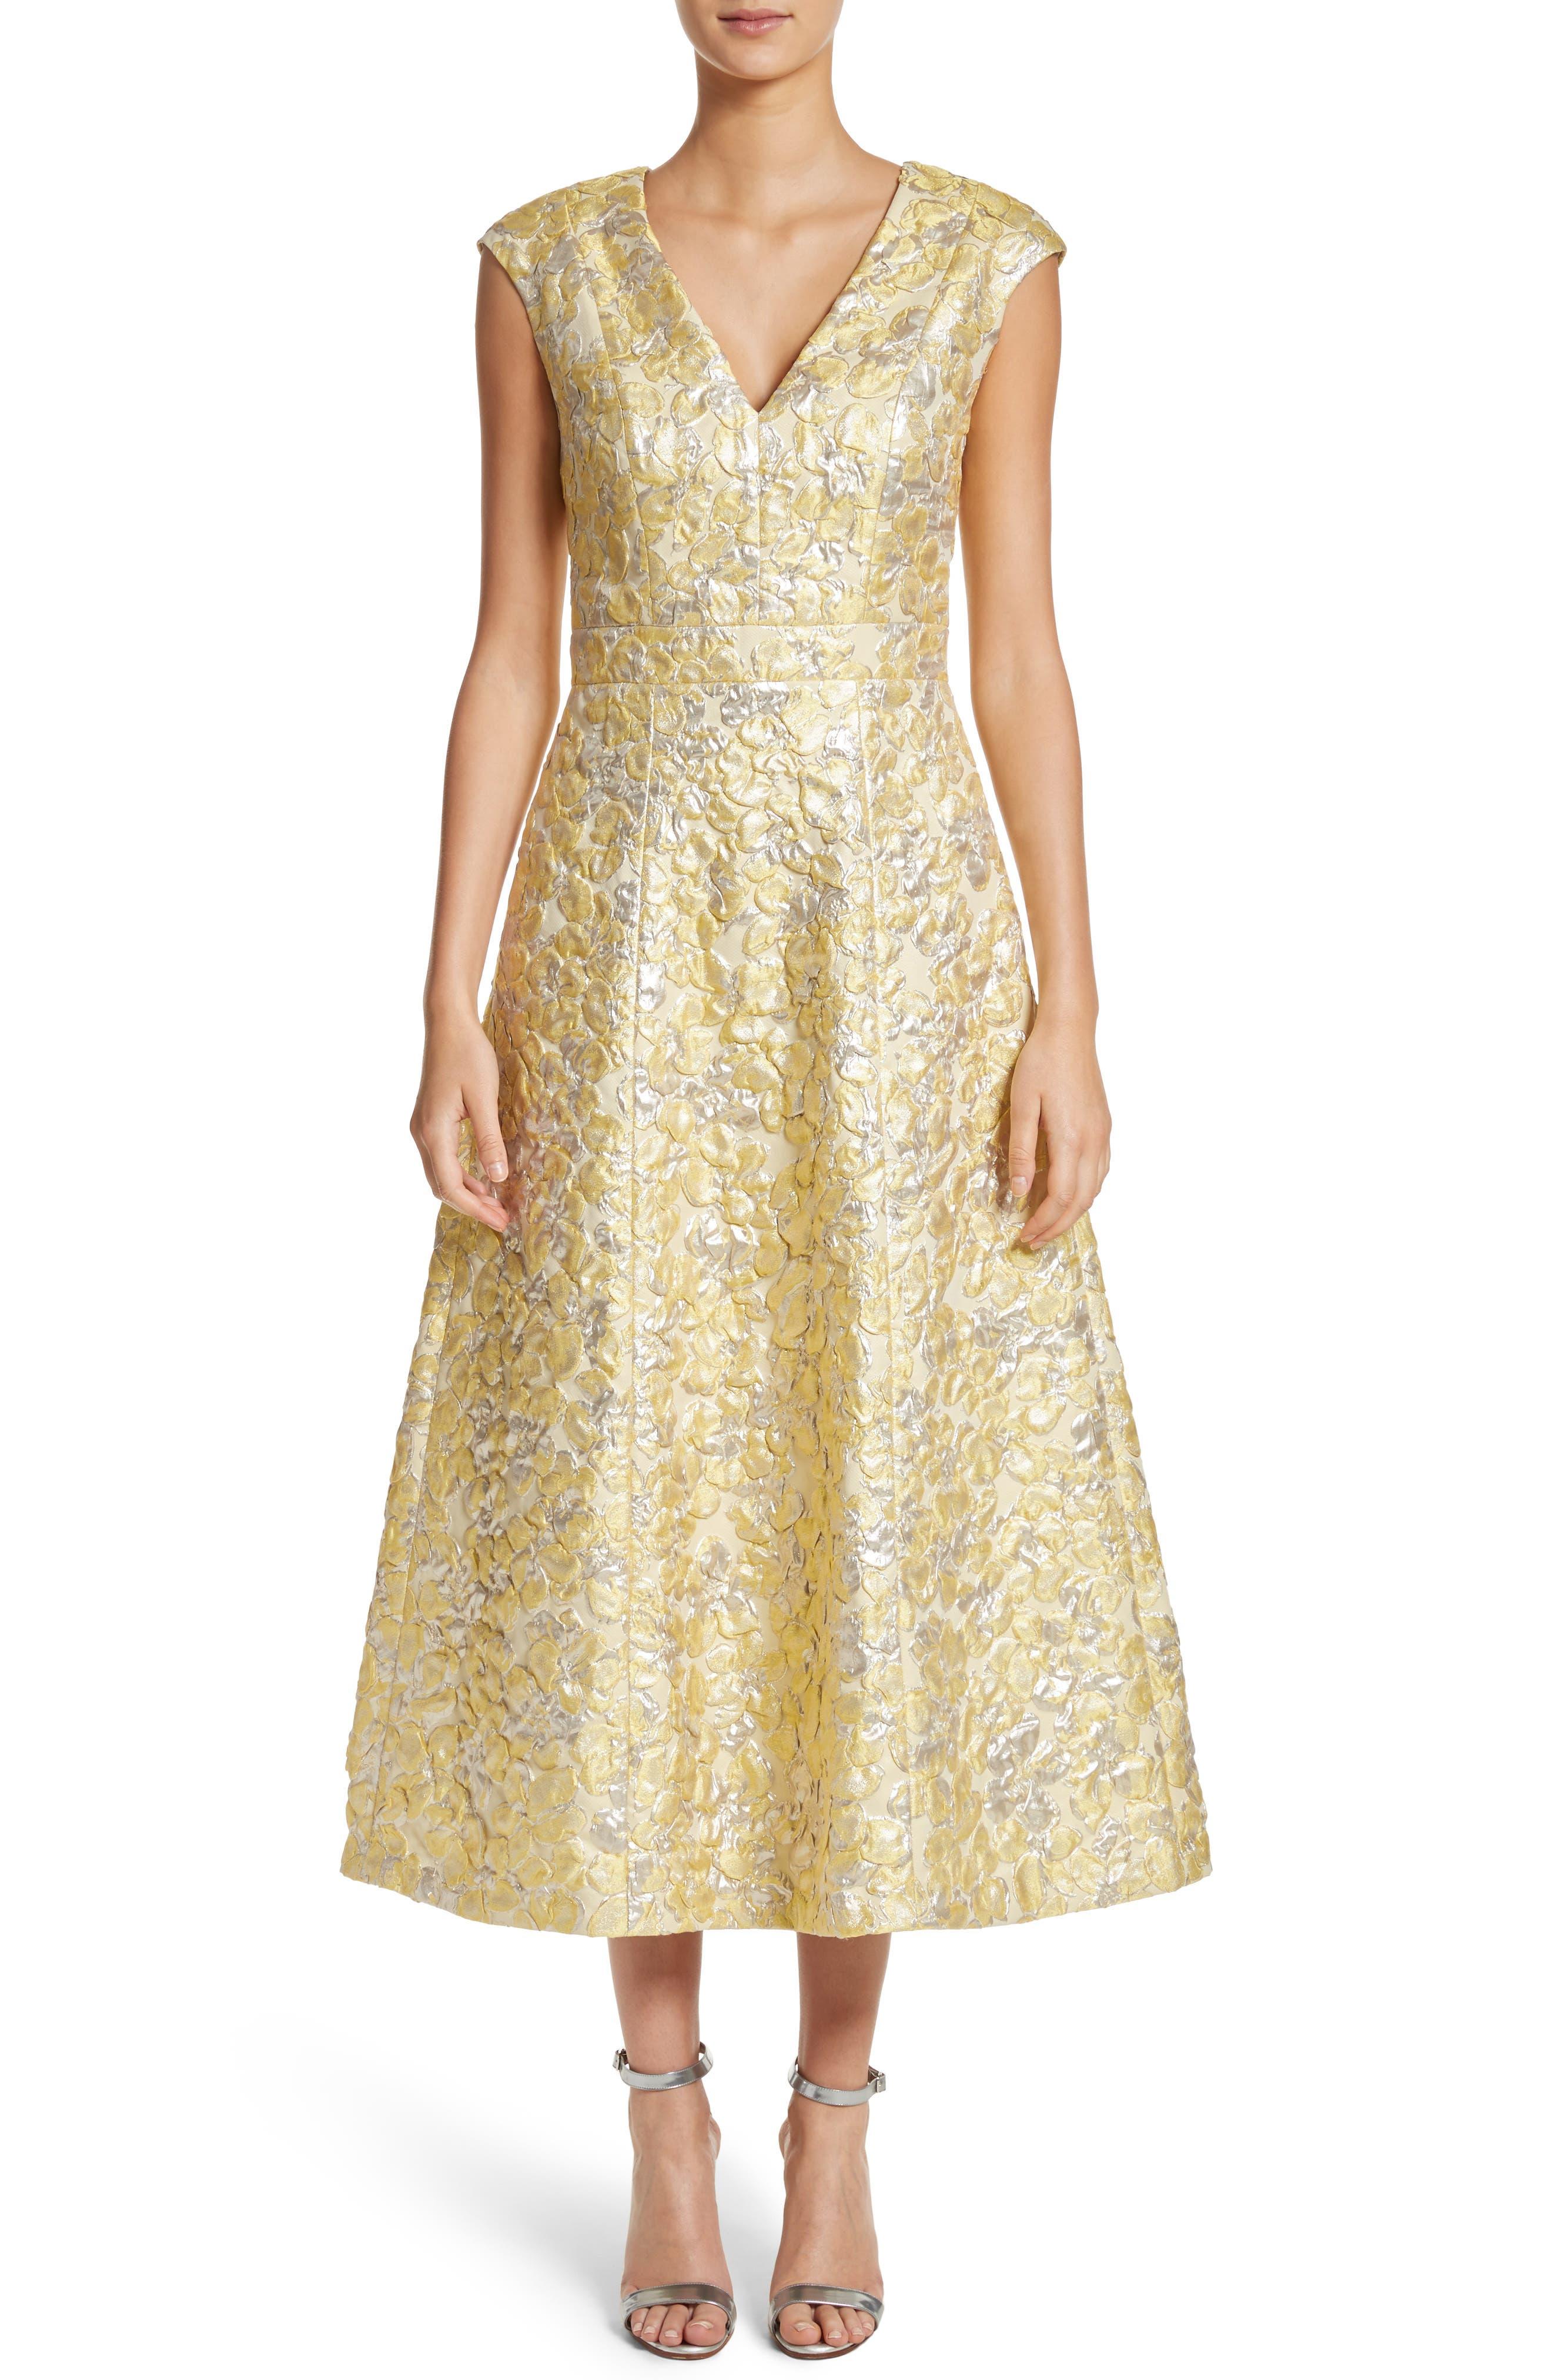 Main Image - St. John Collection Metallic Floral Jacquard Dress